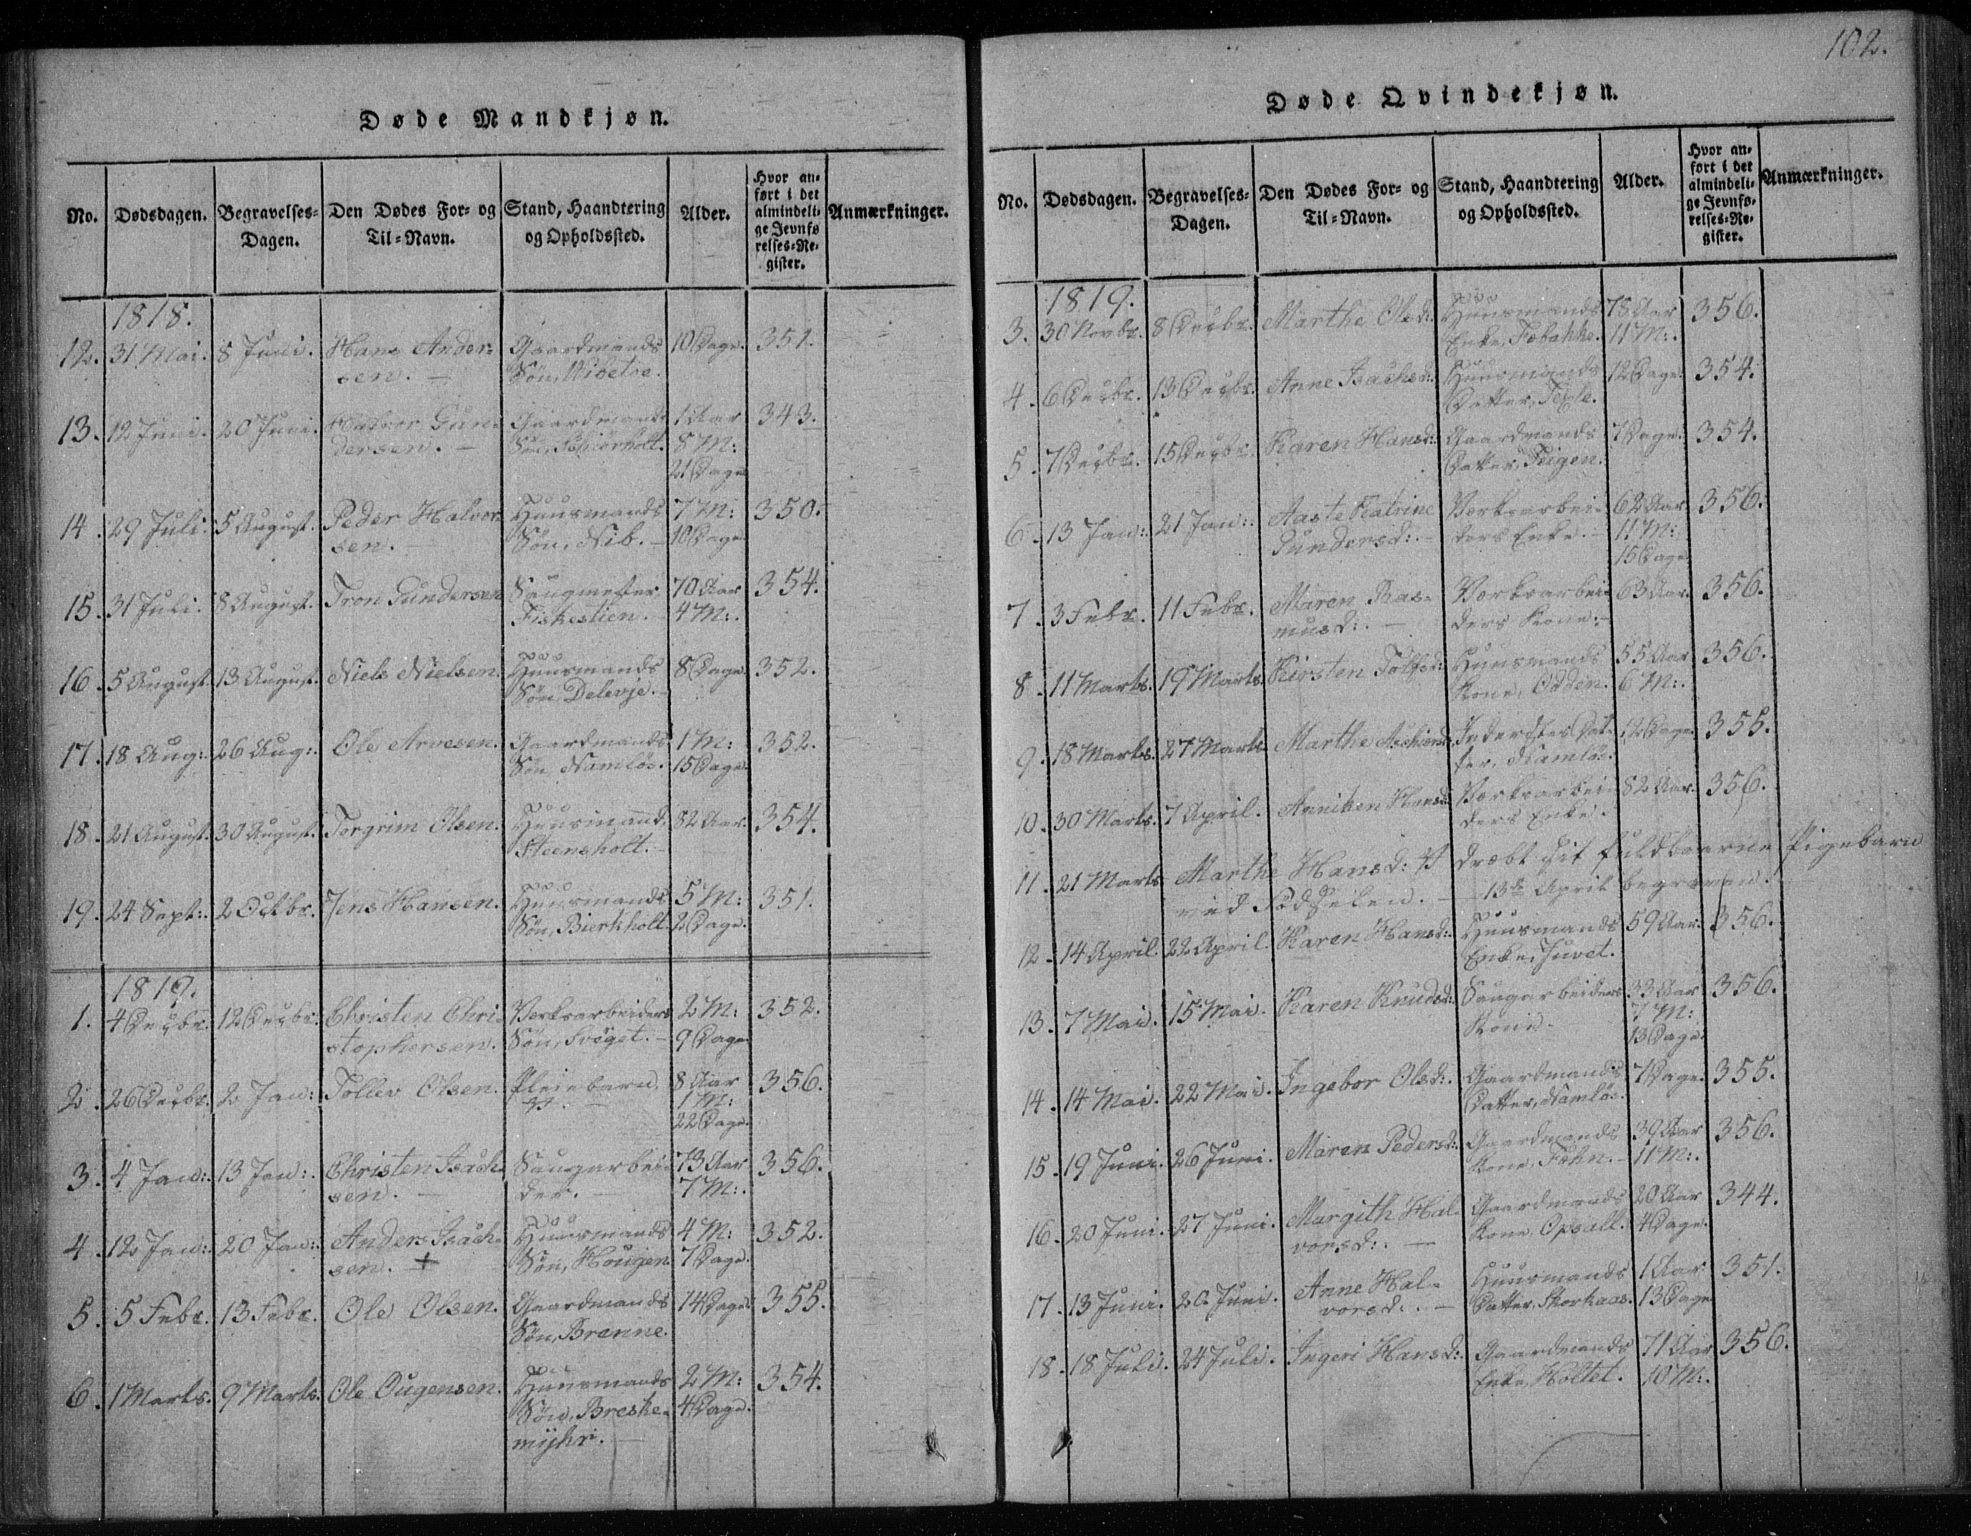 SAKO, Holla kirkebøker, F/Fa/L0003: Ministerialbok nr. 3, 1815-1830, s. 102